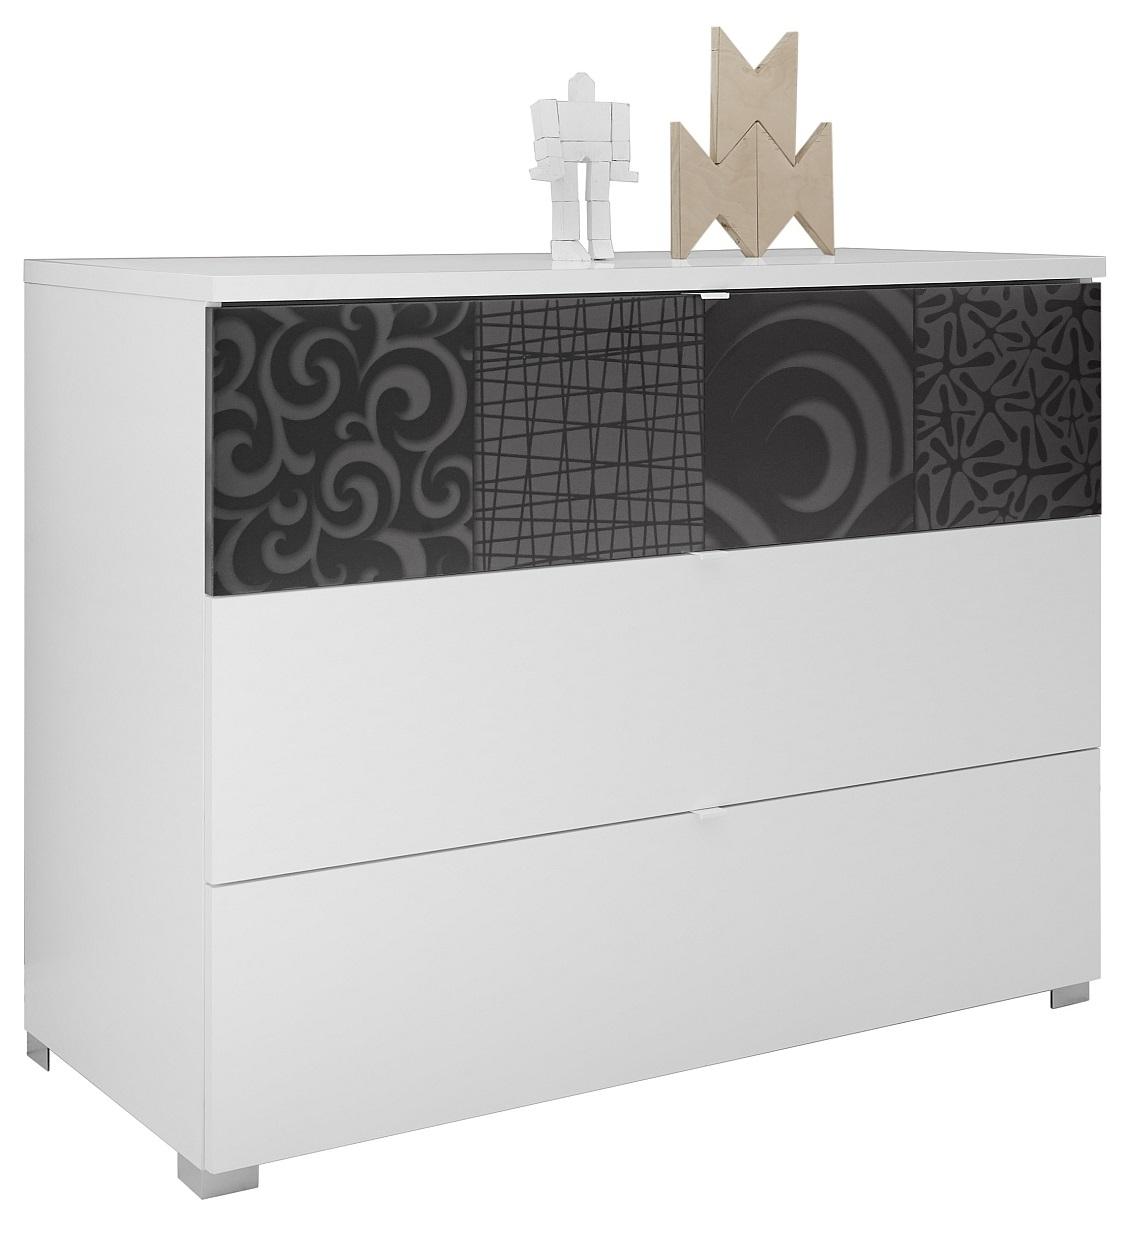 Commode Perez 104 cm breed in mat wit met hoogglans antraciet